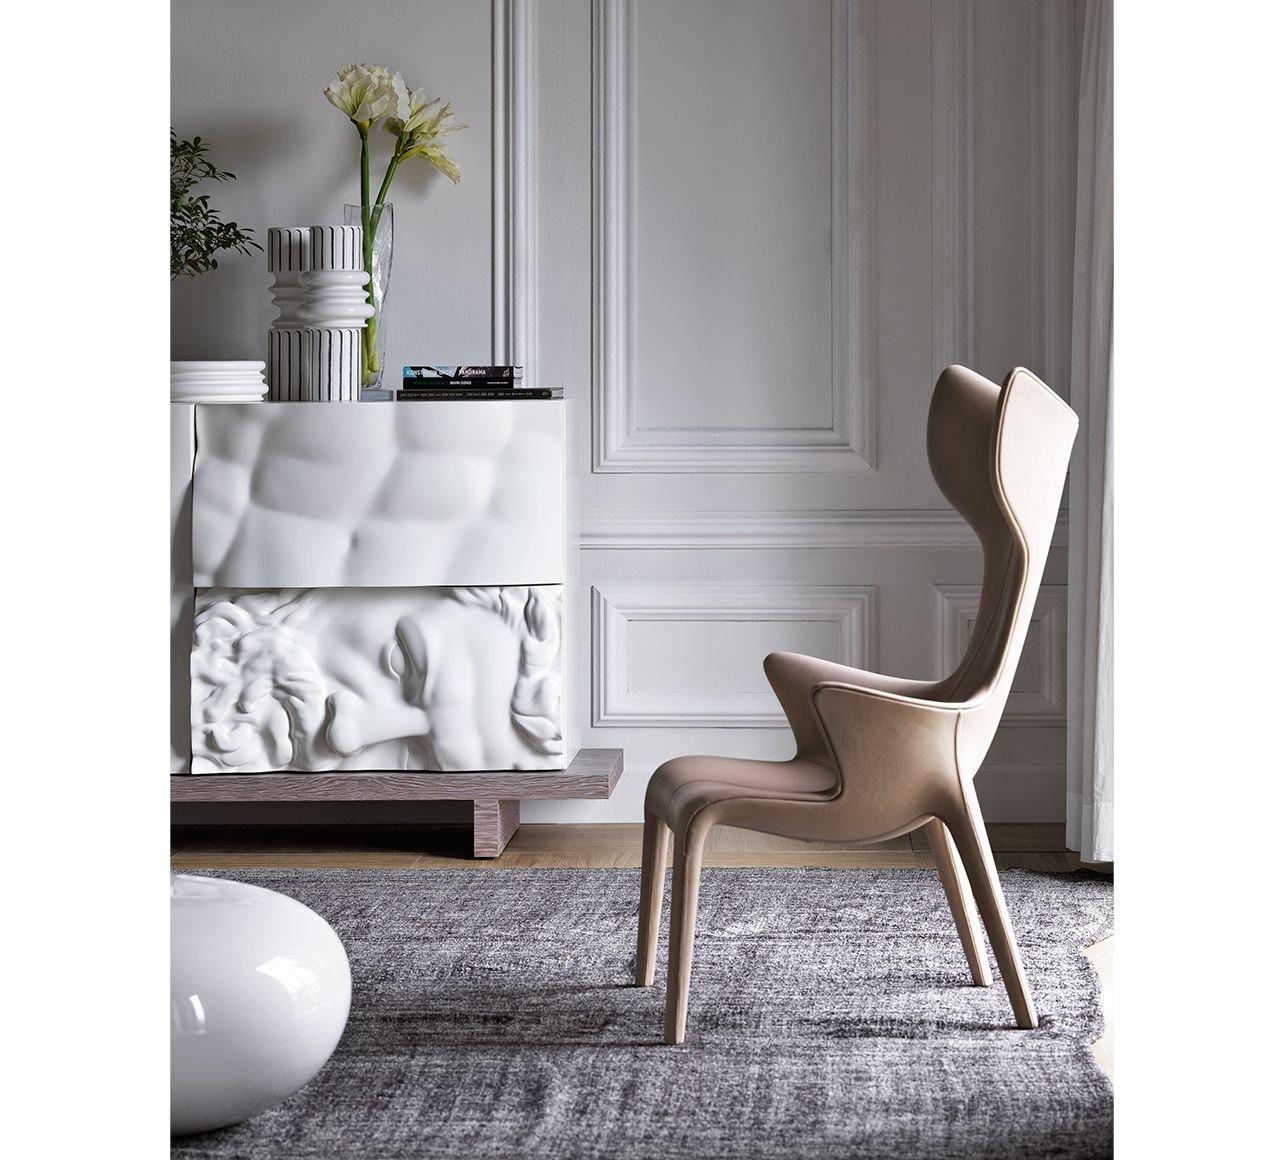 Lou Read Armchair from Driade